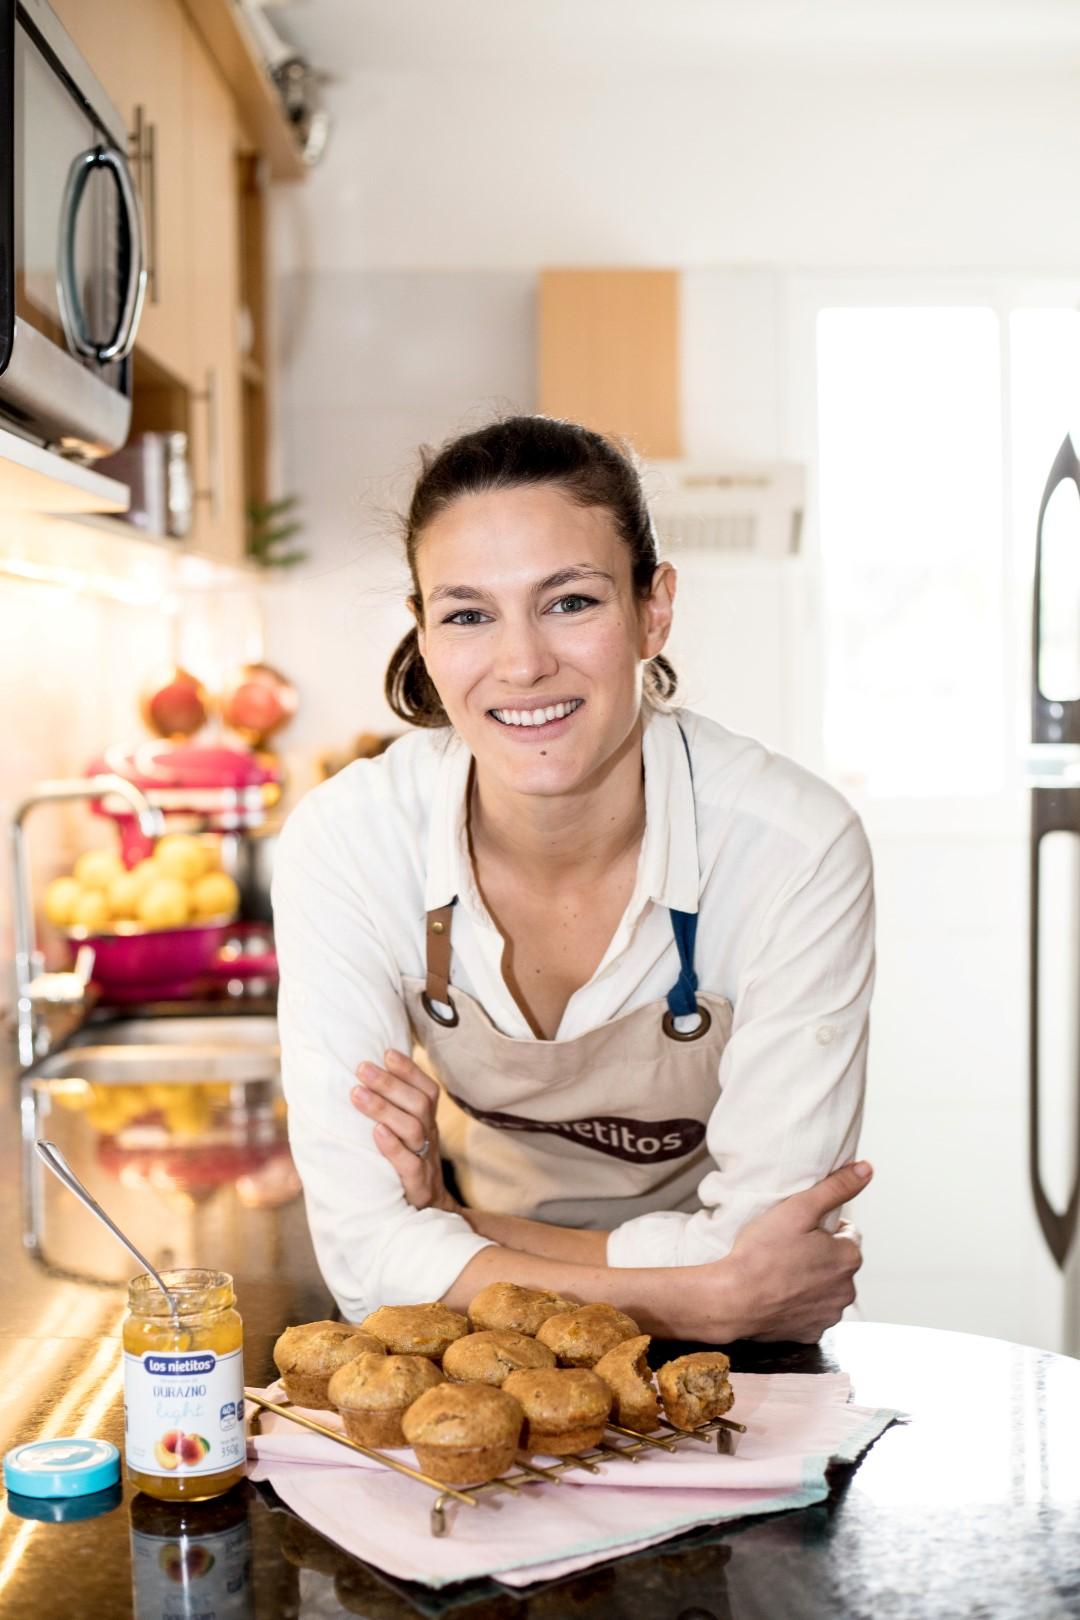 muffins sin gluten, gluten free, pastelería light, recetas de cocina.